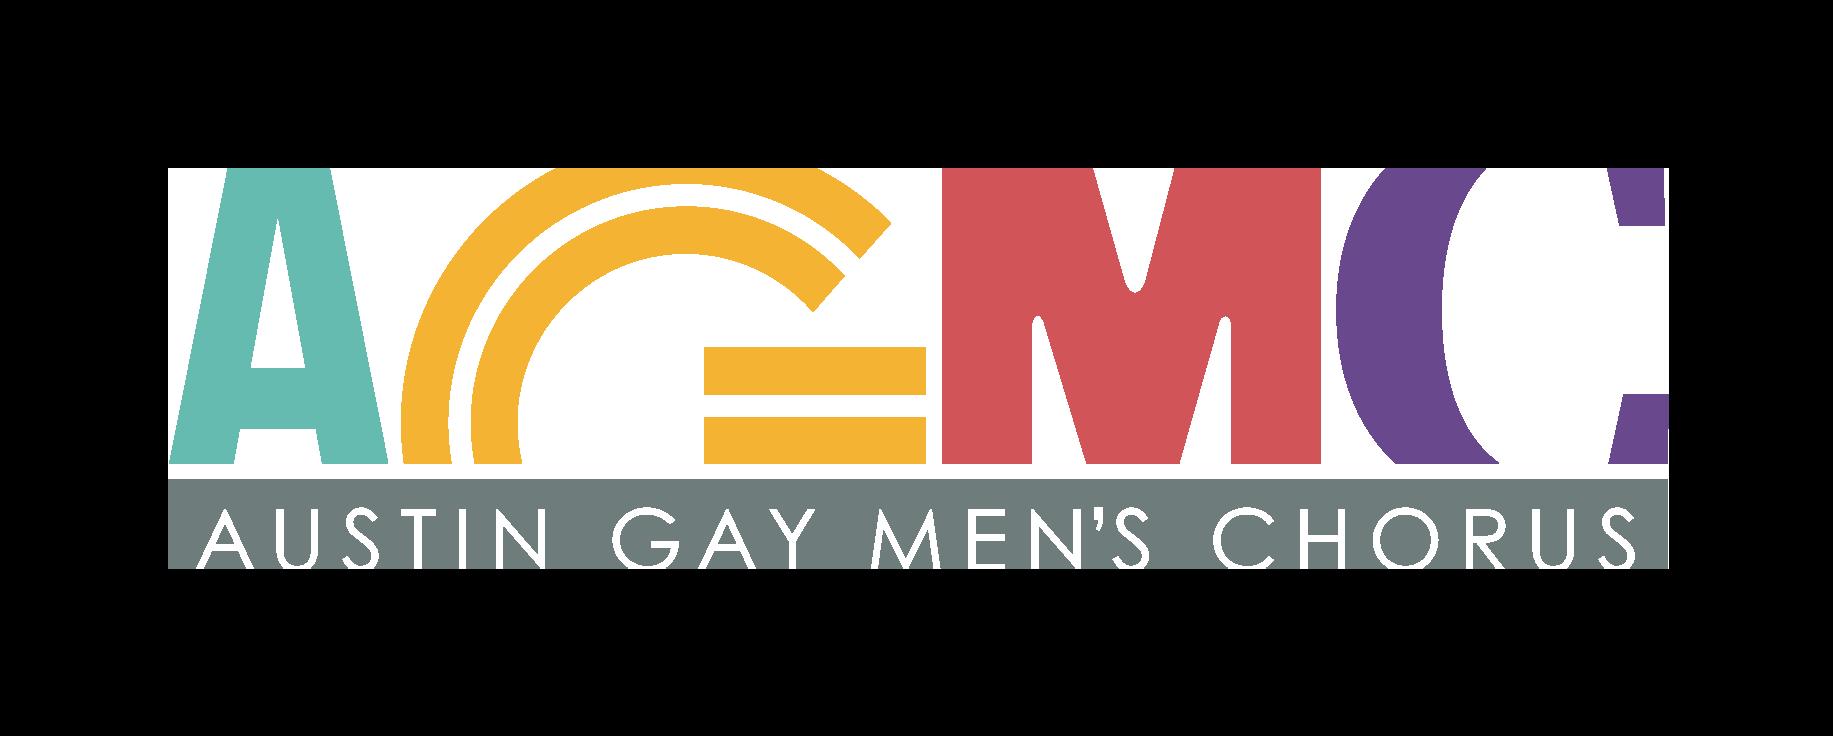 Austin Gay Men's Chorus - Community Sponsor.png